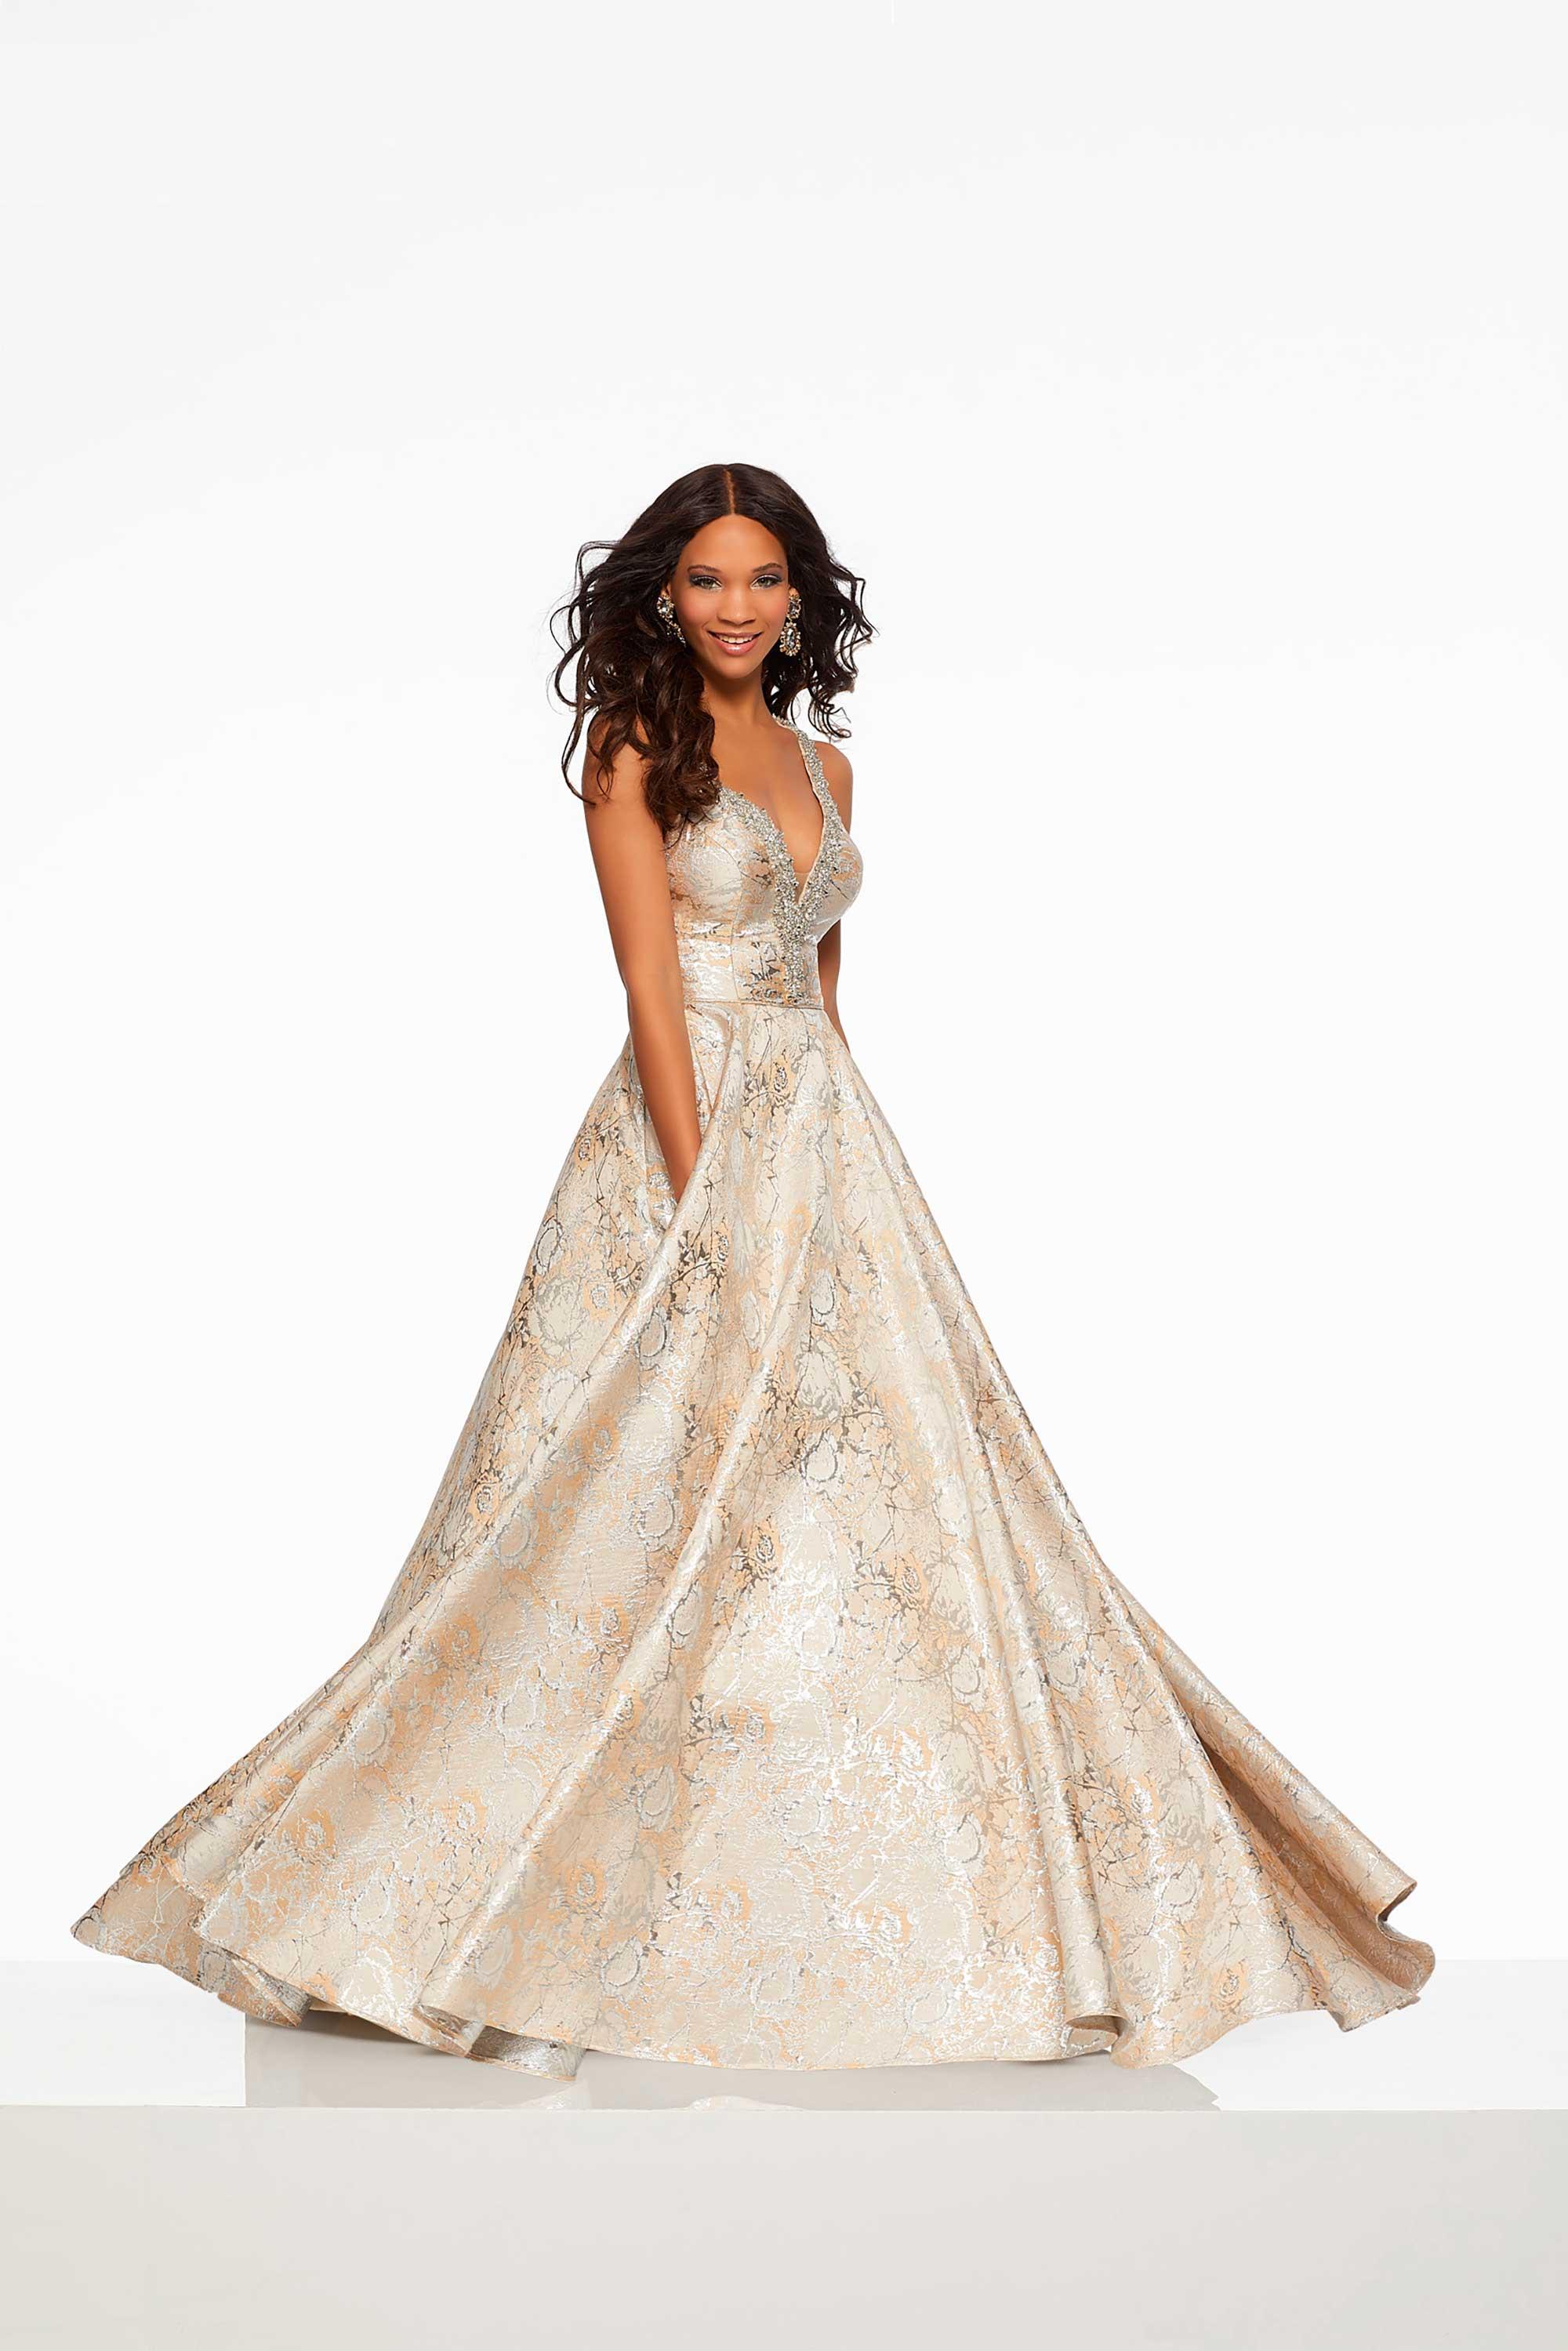 Vestido Lucía Fiesta 2019 mod. 43070 - 6